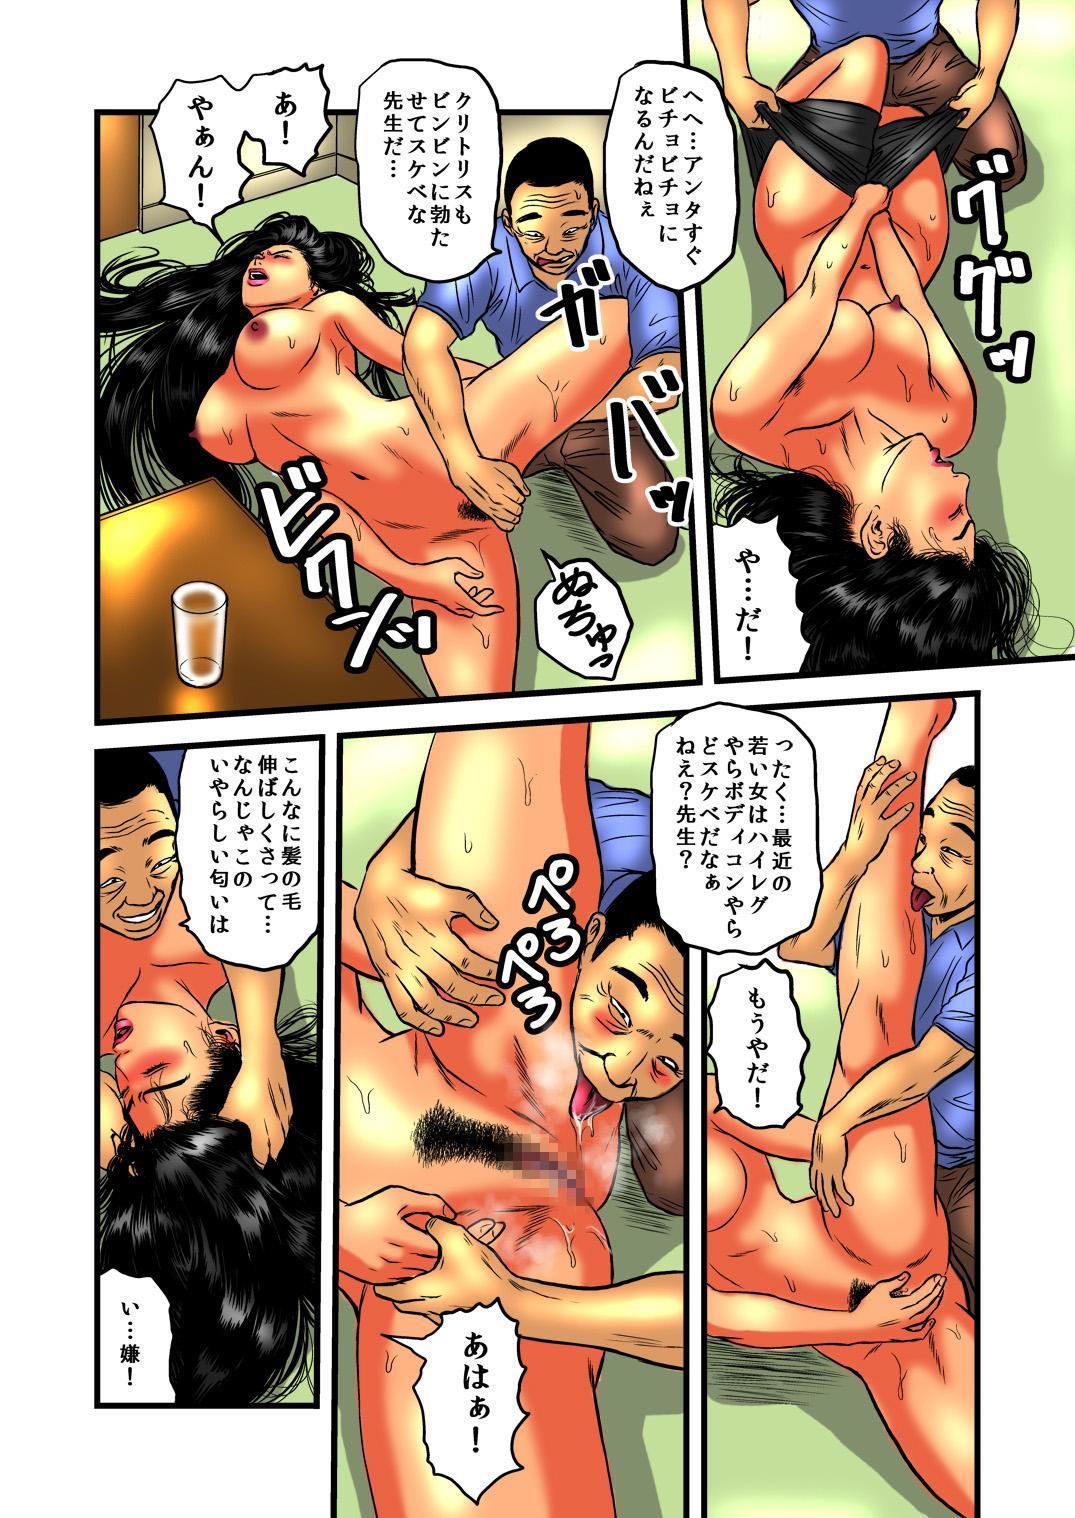 Ryoujoku no Katei Houmon ・ Zenpen 14